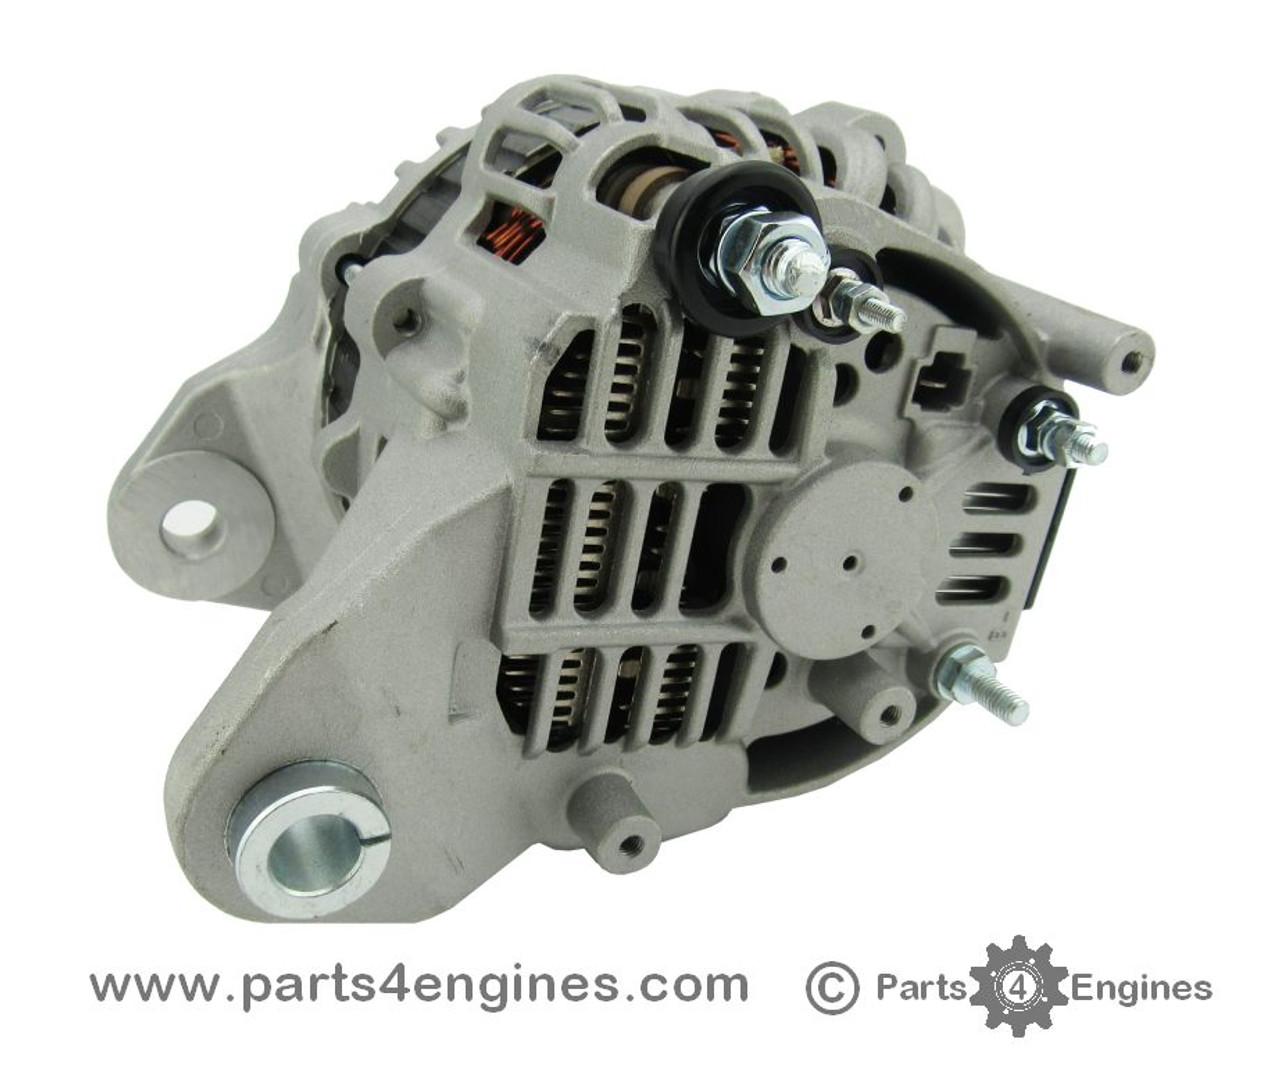 Volvo Penta D2-40 Alternator from Parts4Engines.com